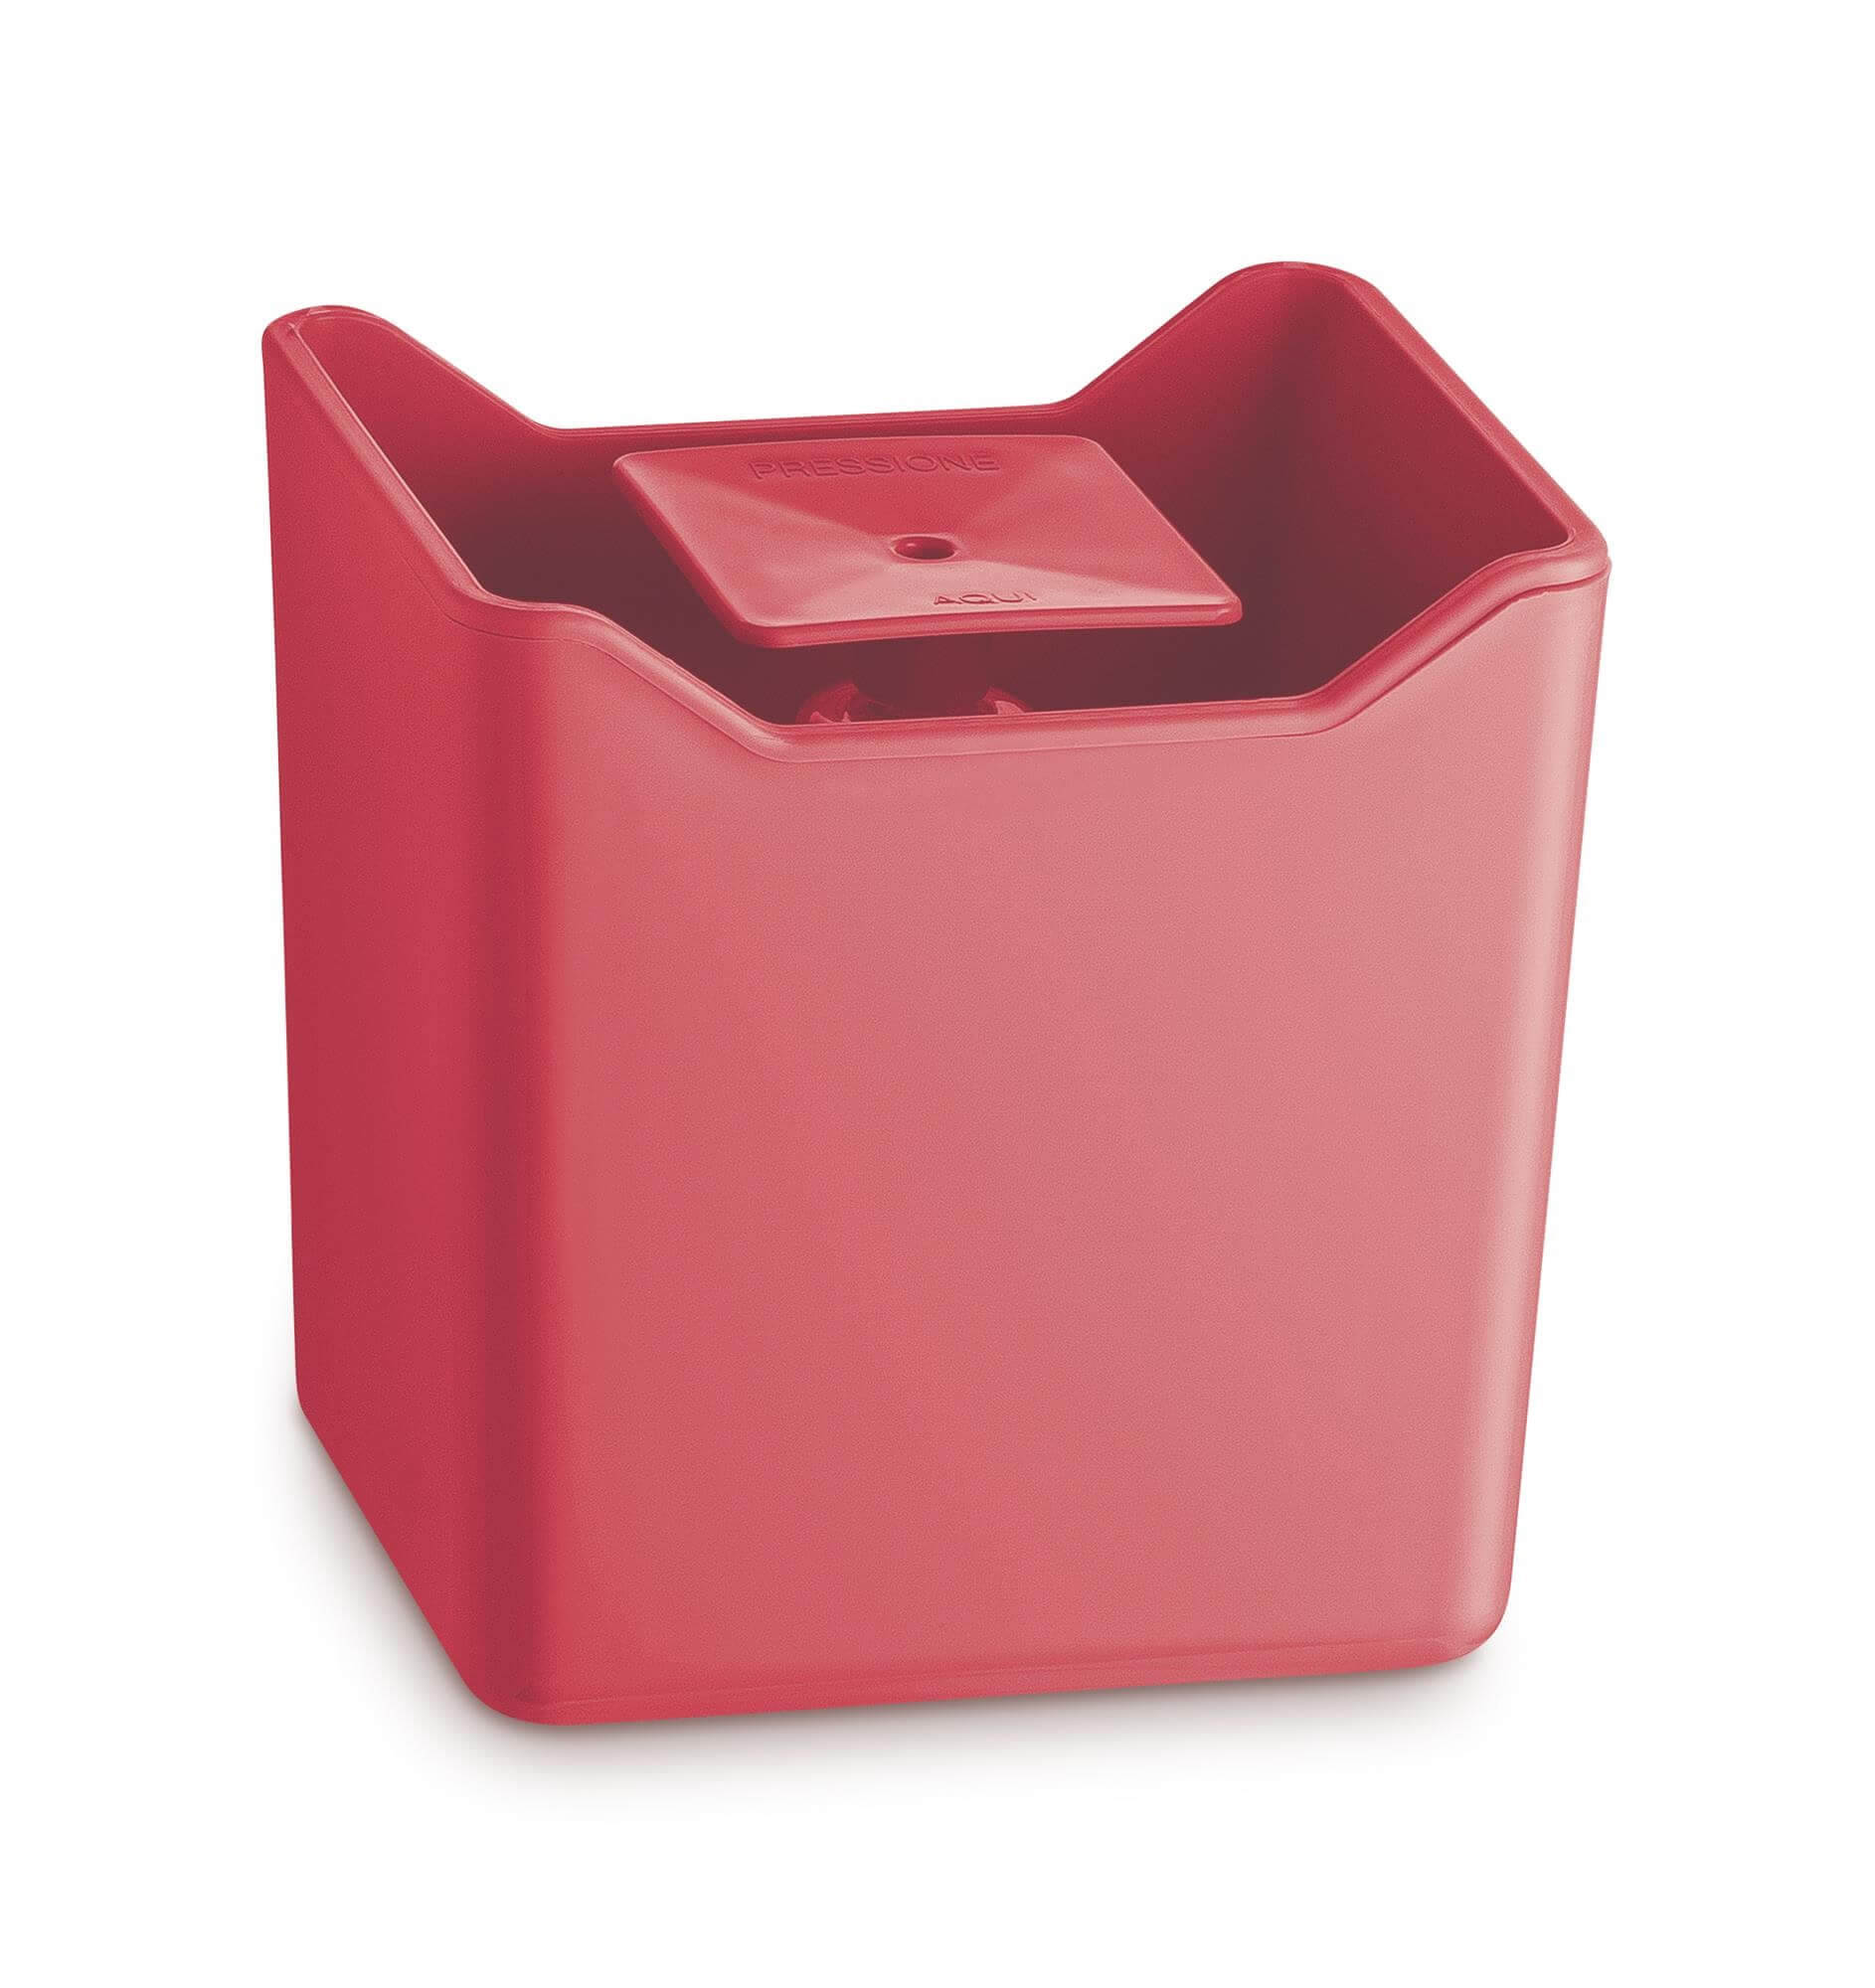 Dispenser Porta Detergente Plástico UZ Coral